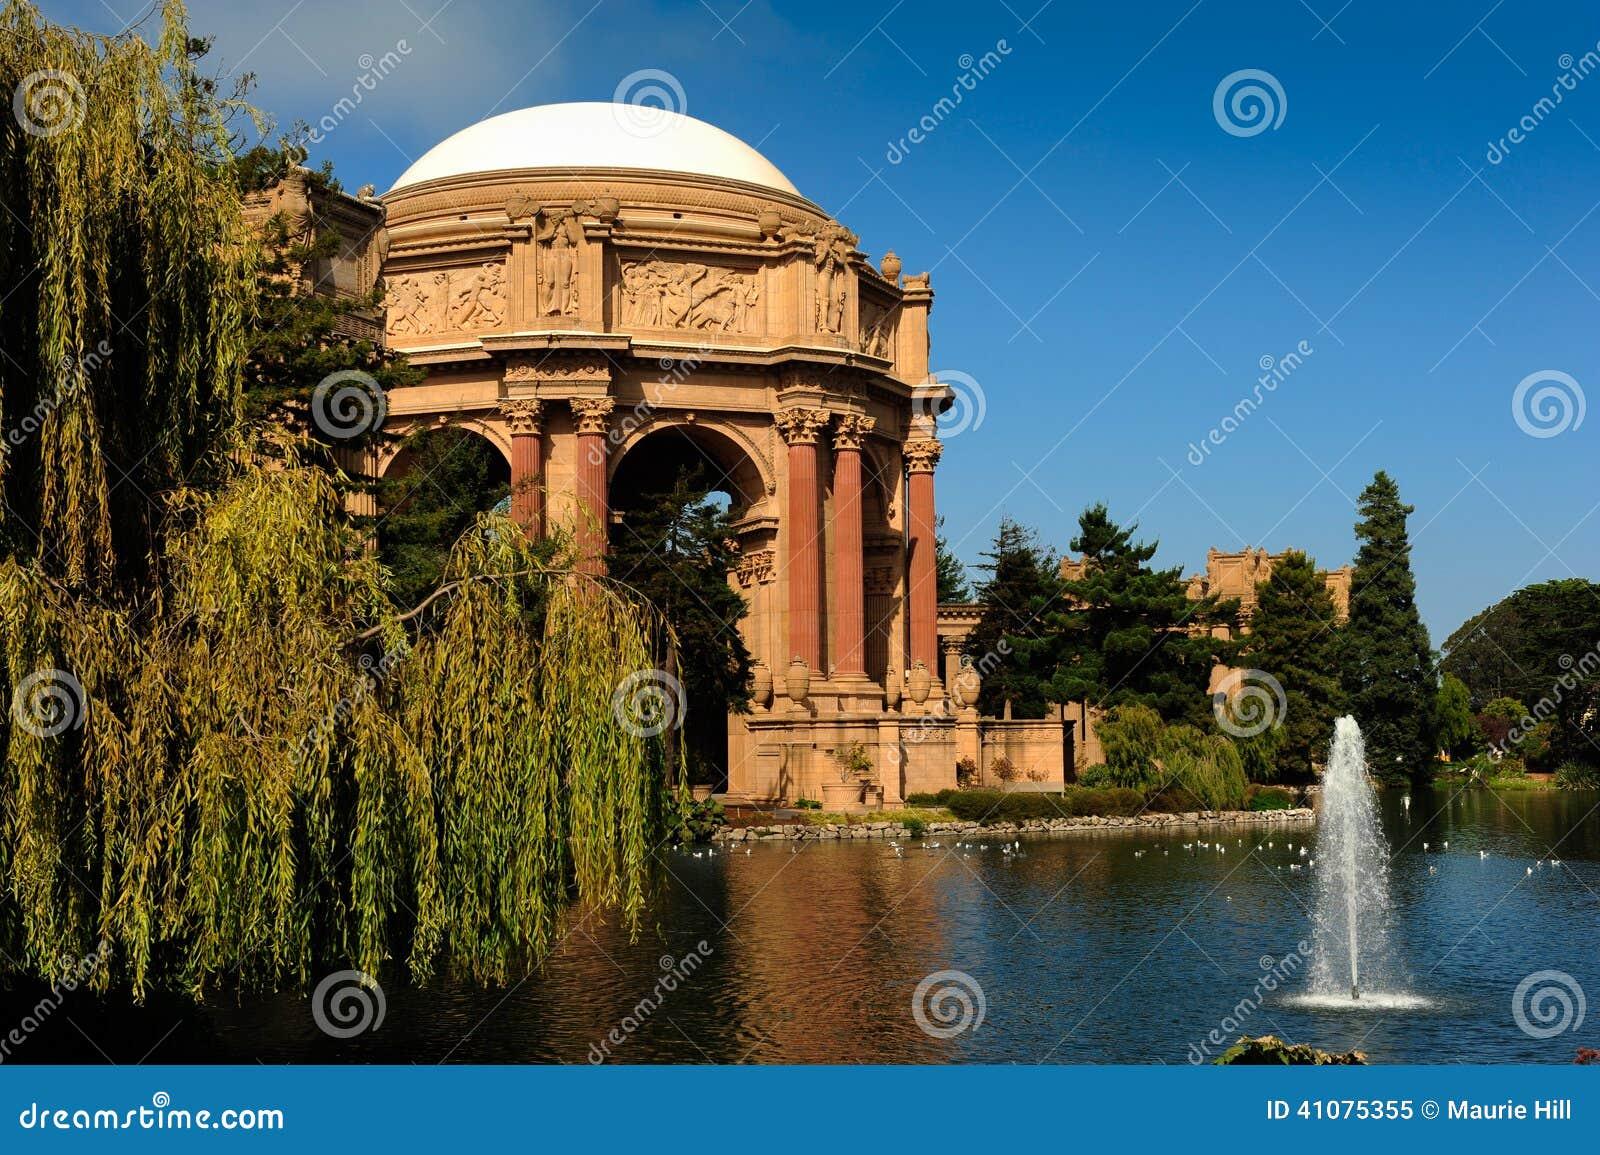 Palace Of Fine Arts San Francisco Stock Image Image Of Beaux